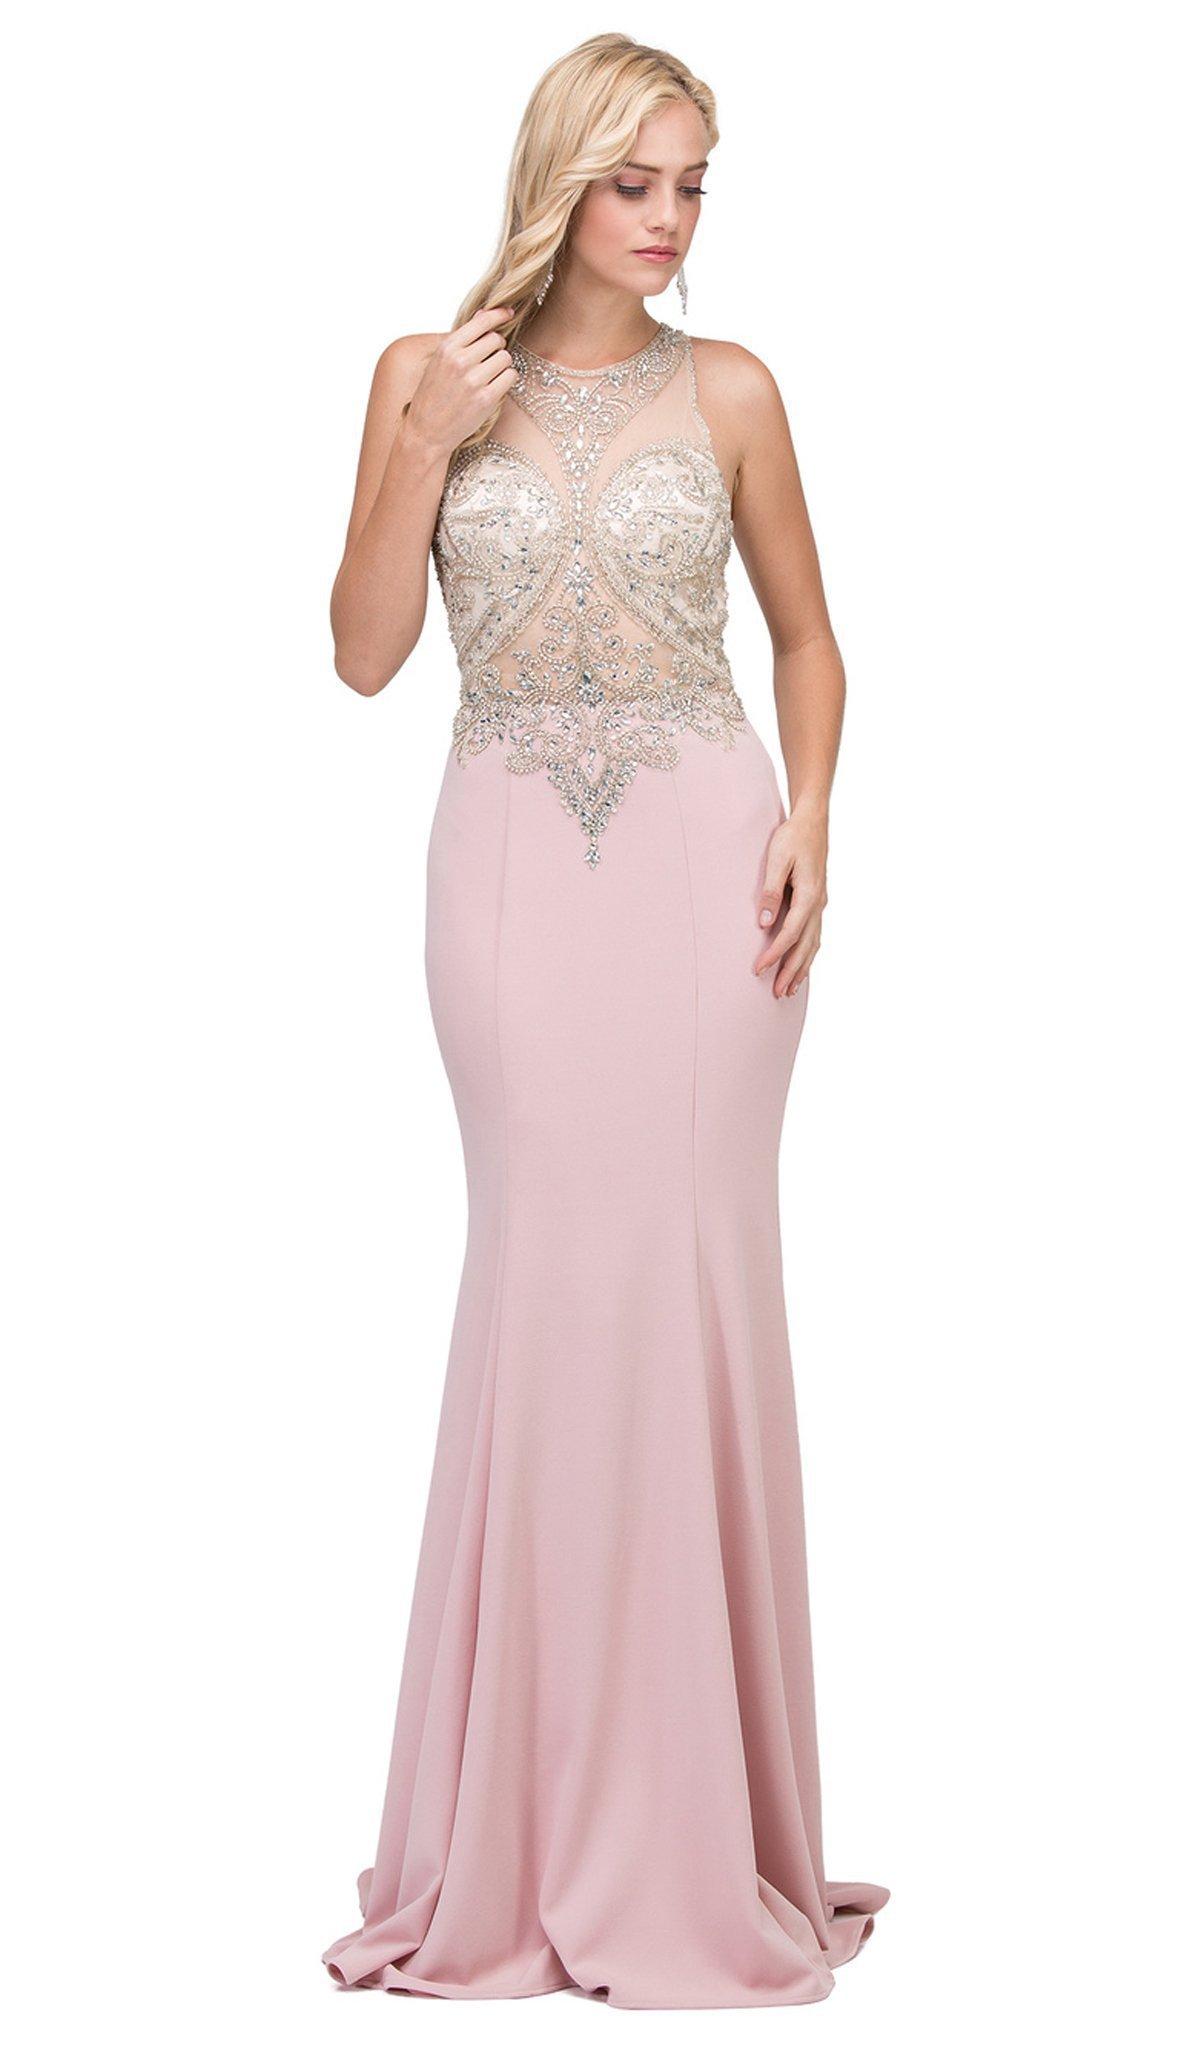 Dancing Queen - 2433 Sleeveless Jeweled Illusion Halter Sheath Prom Dress